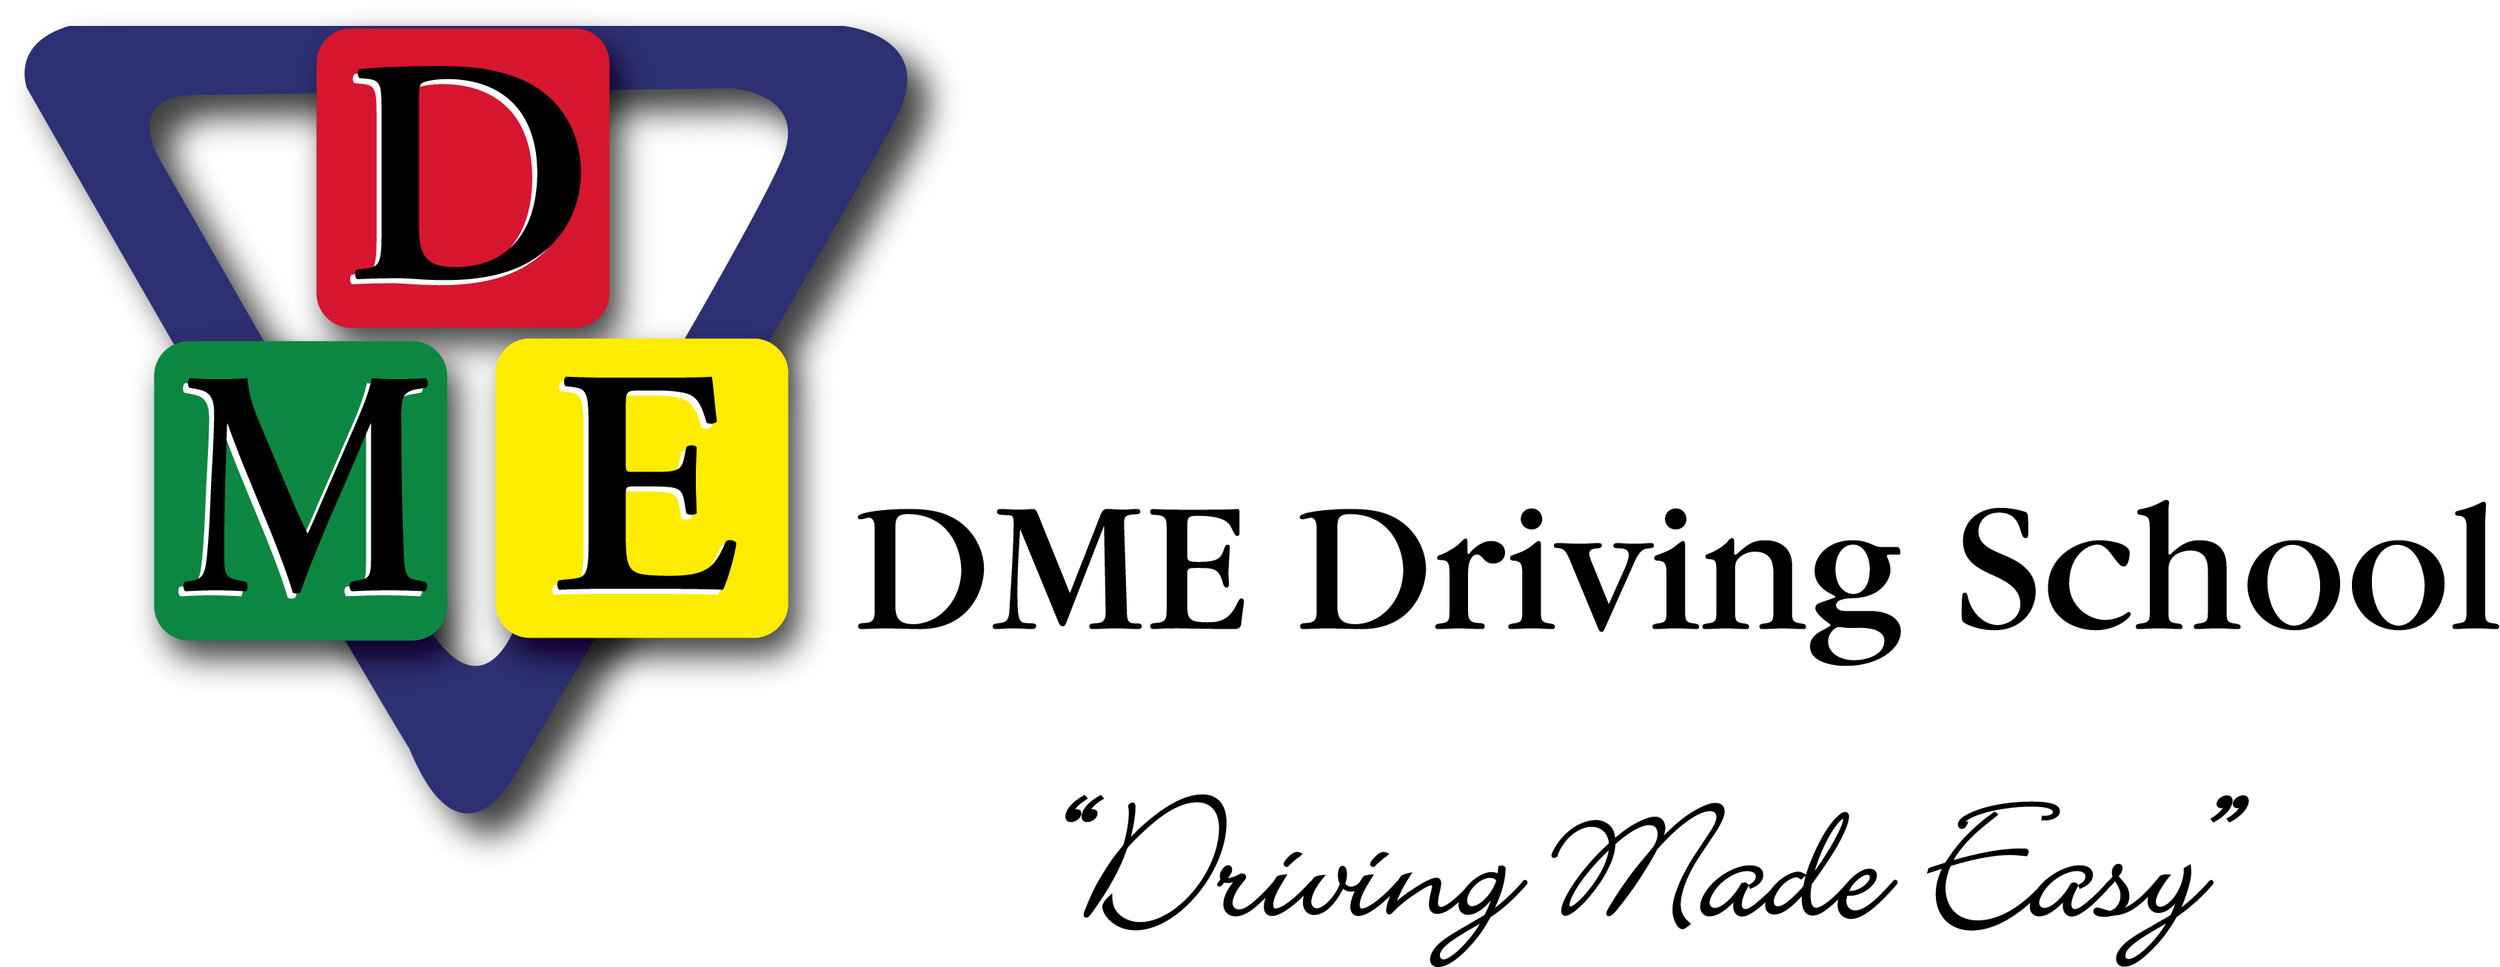 dme_vector logo(1).JPG